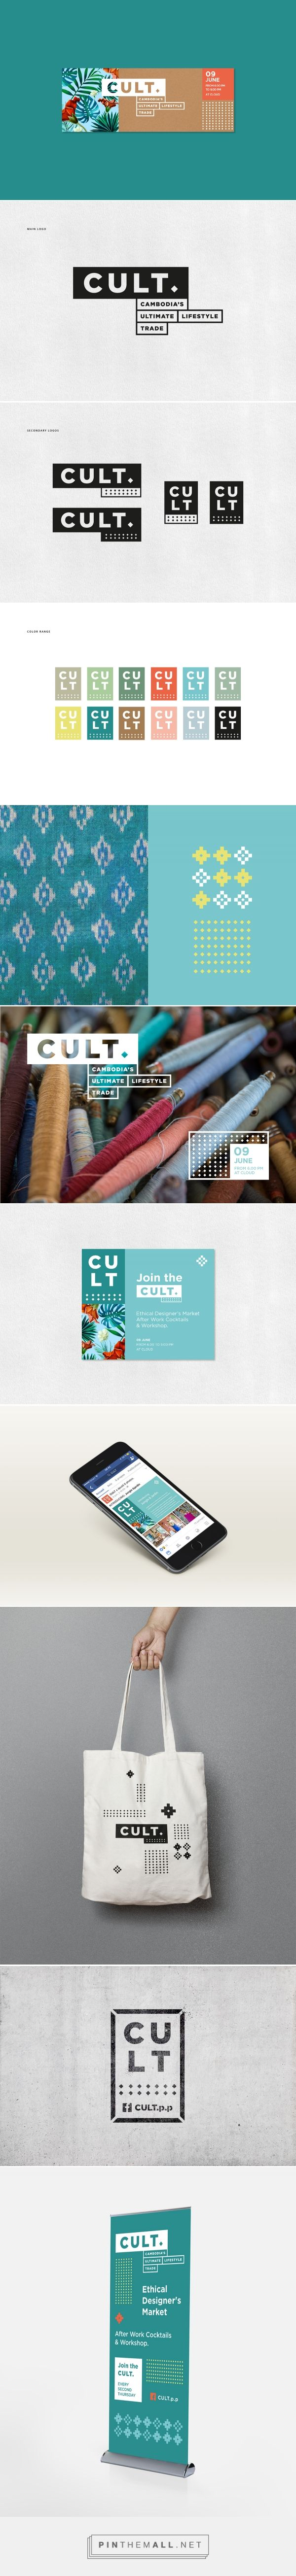 CULT. on Behance - created via https://pinthemall.net